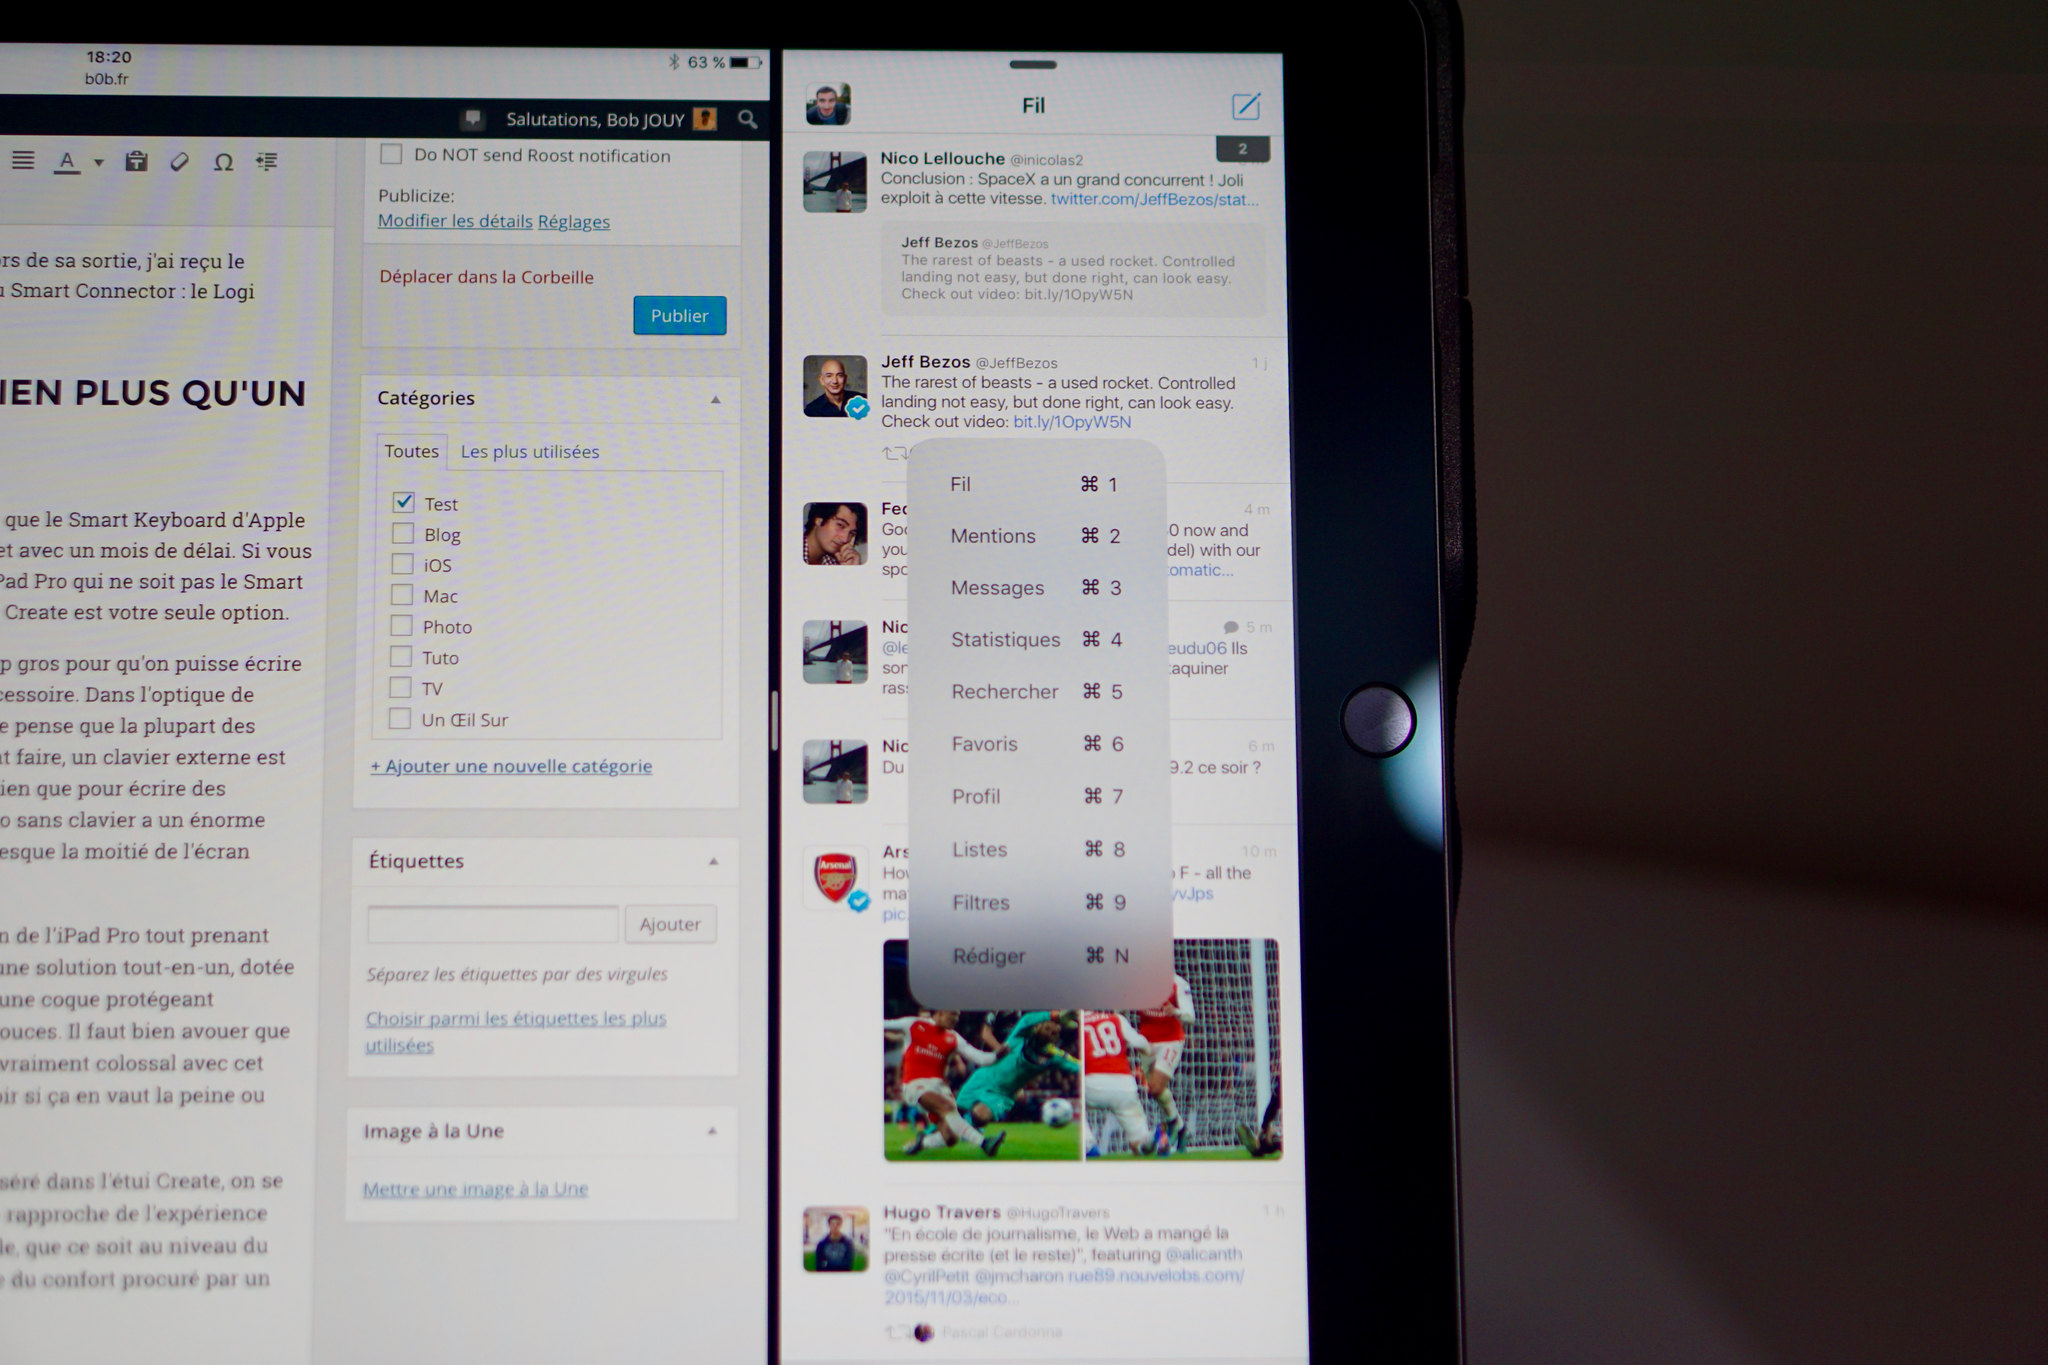 Test du clavier Logi Create pour iPad Pro